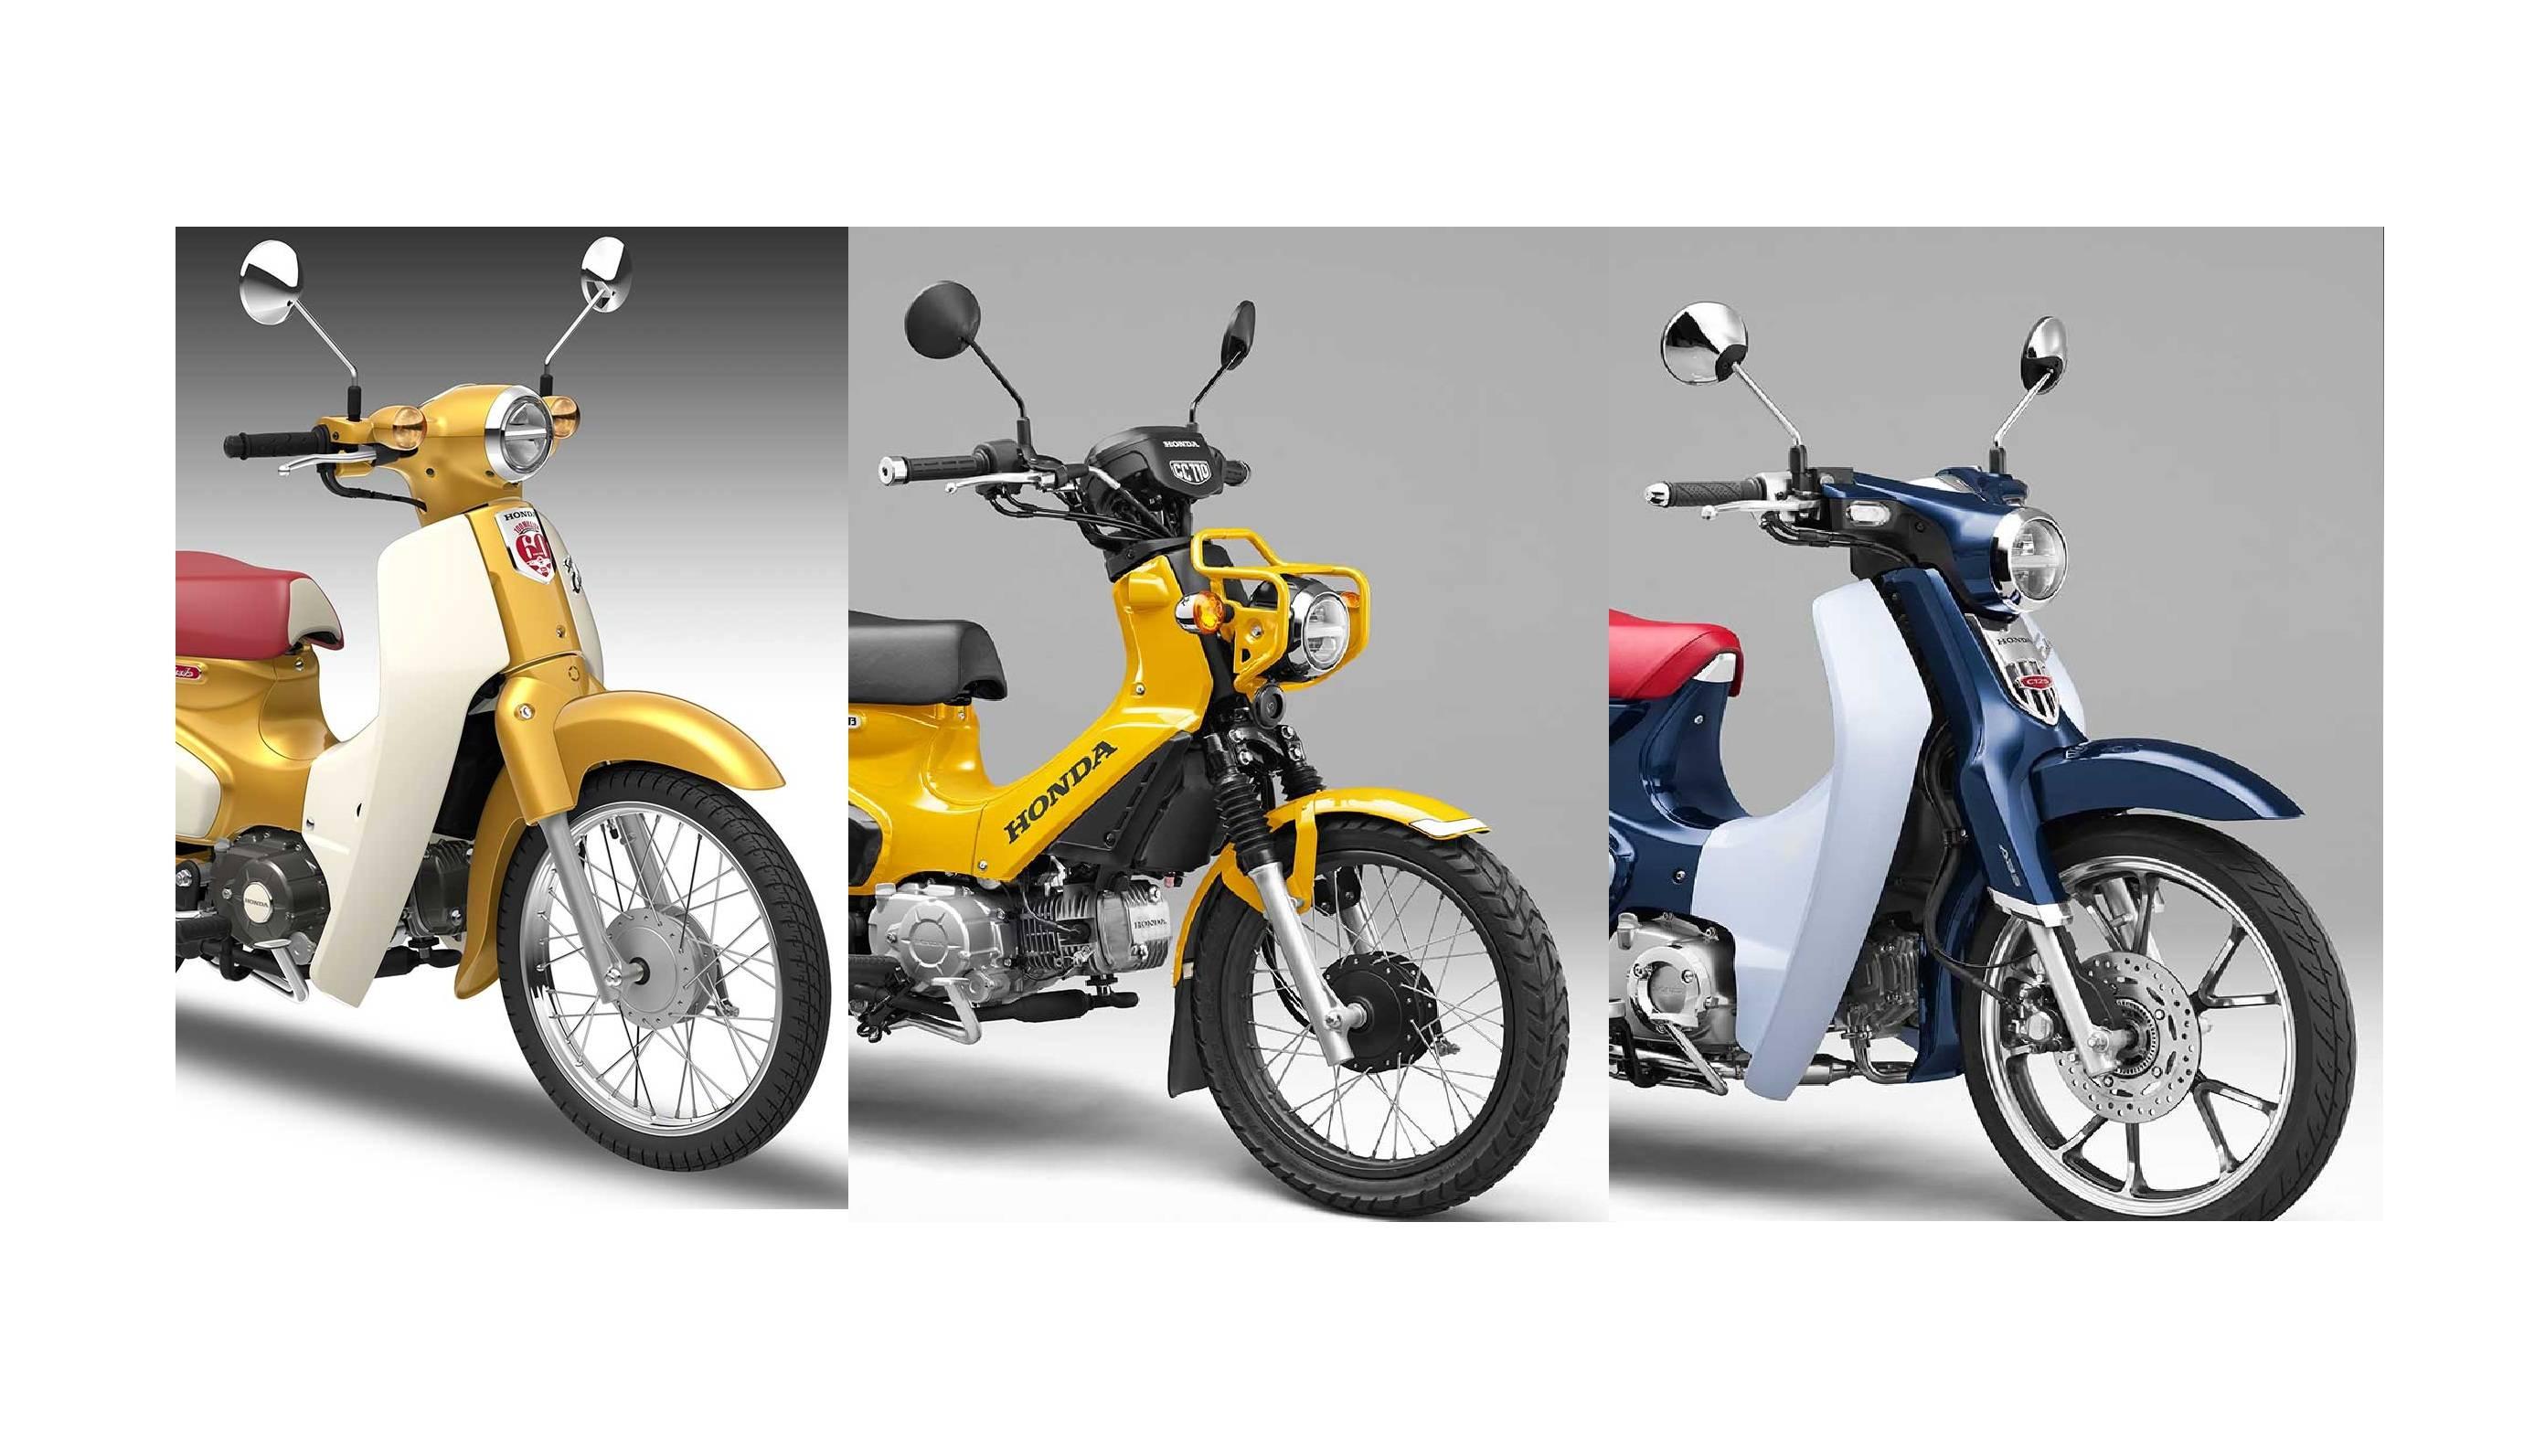 Galeri Foto Honda Super Cub 110 125 Dan Cross Cub Concept Edisi